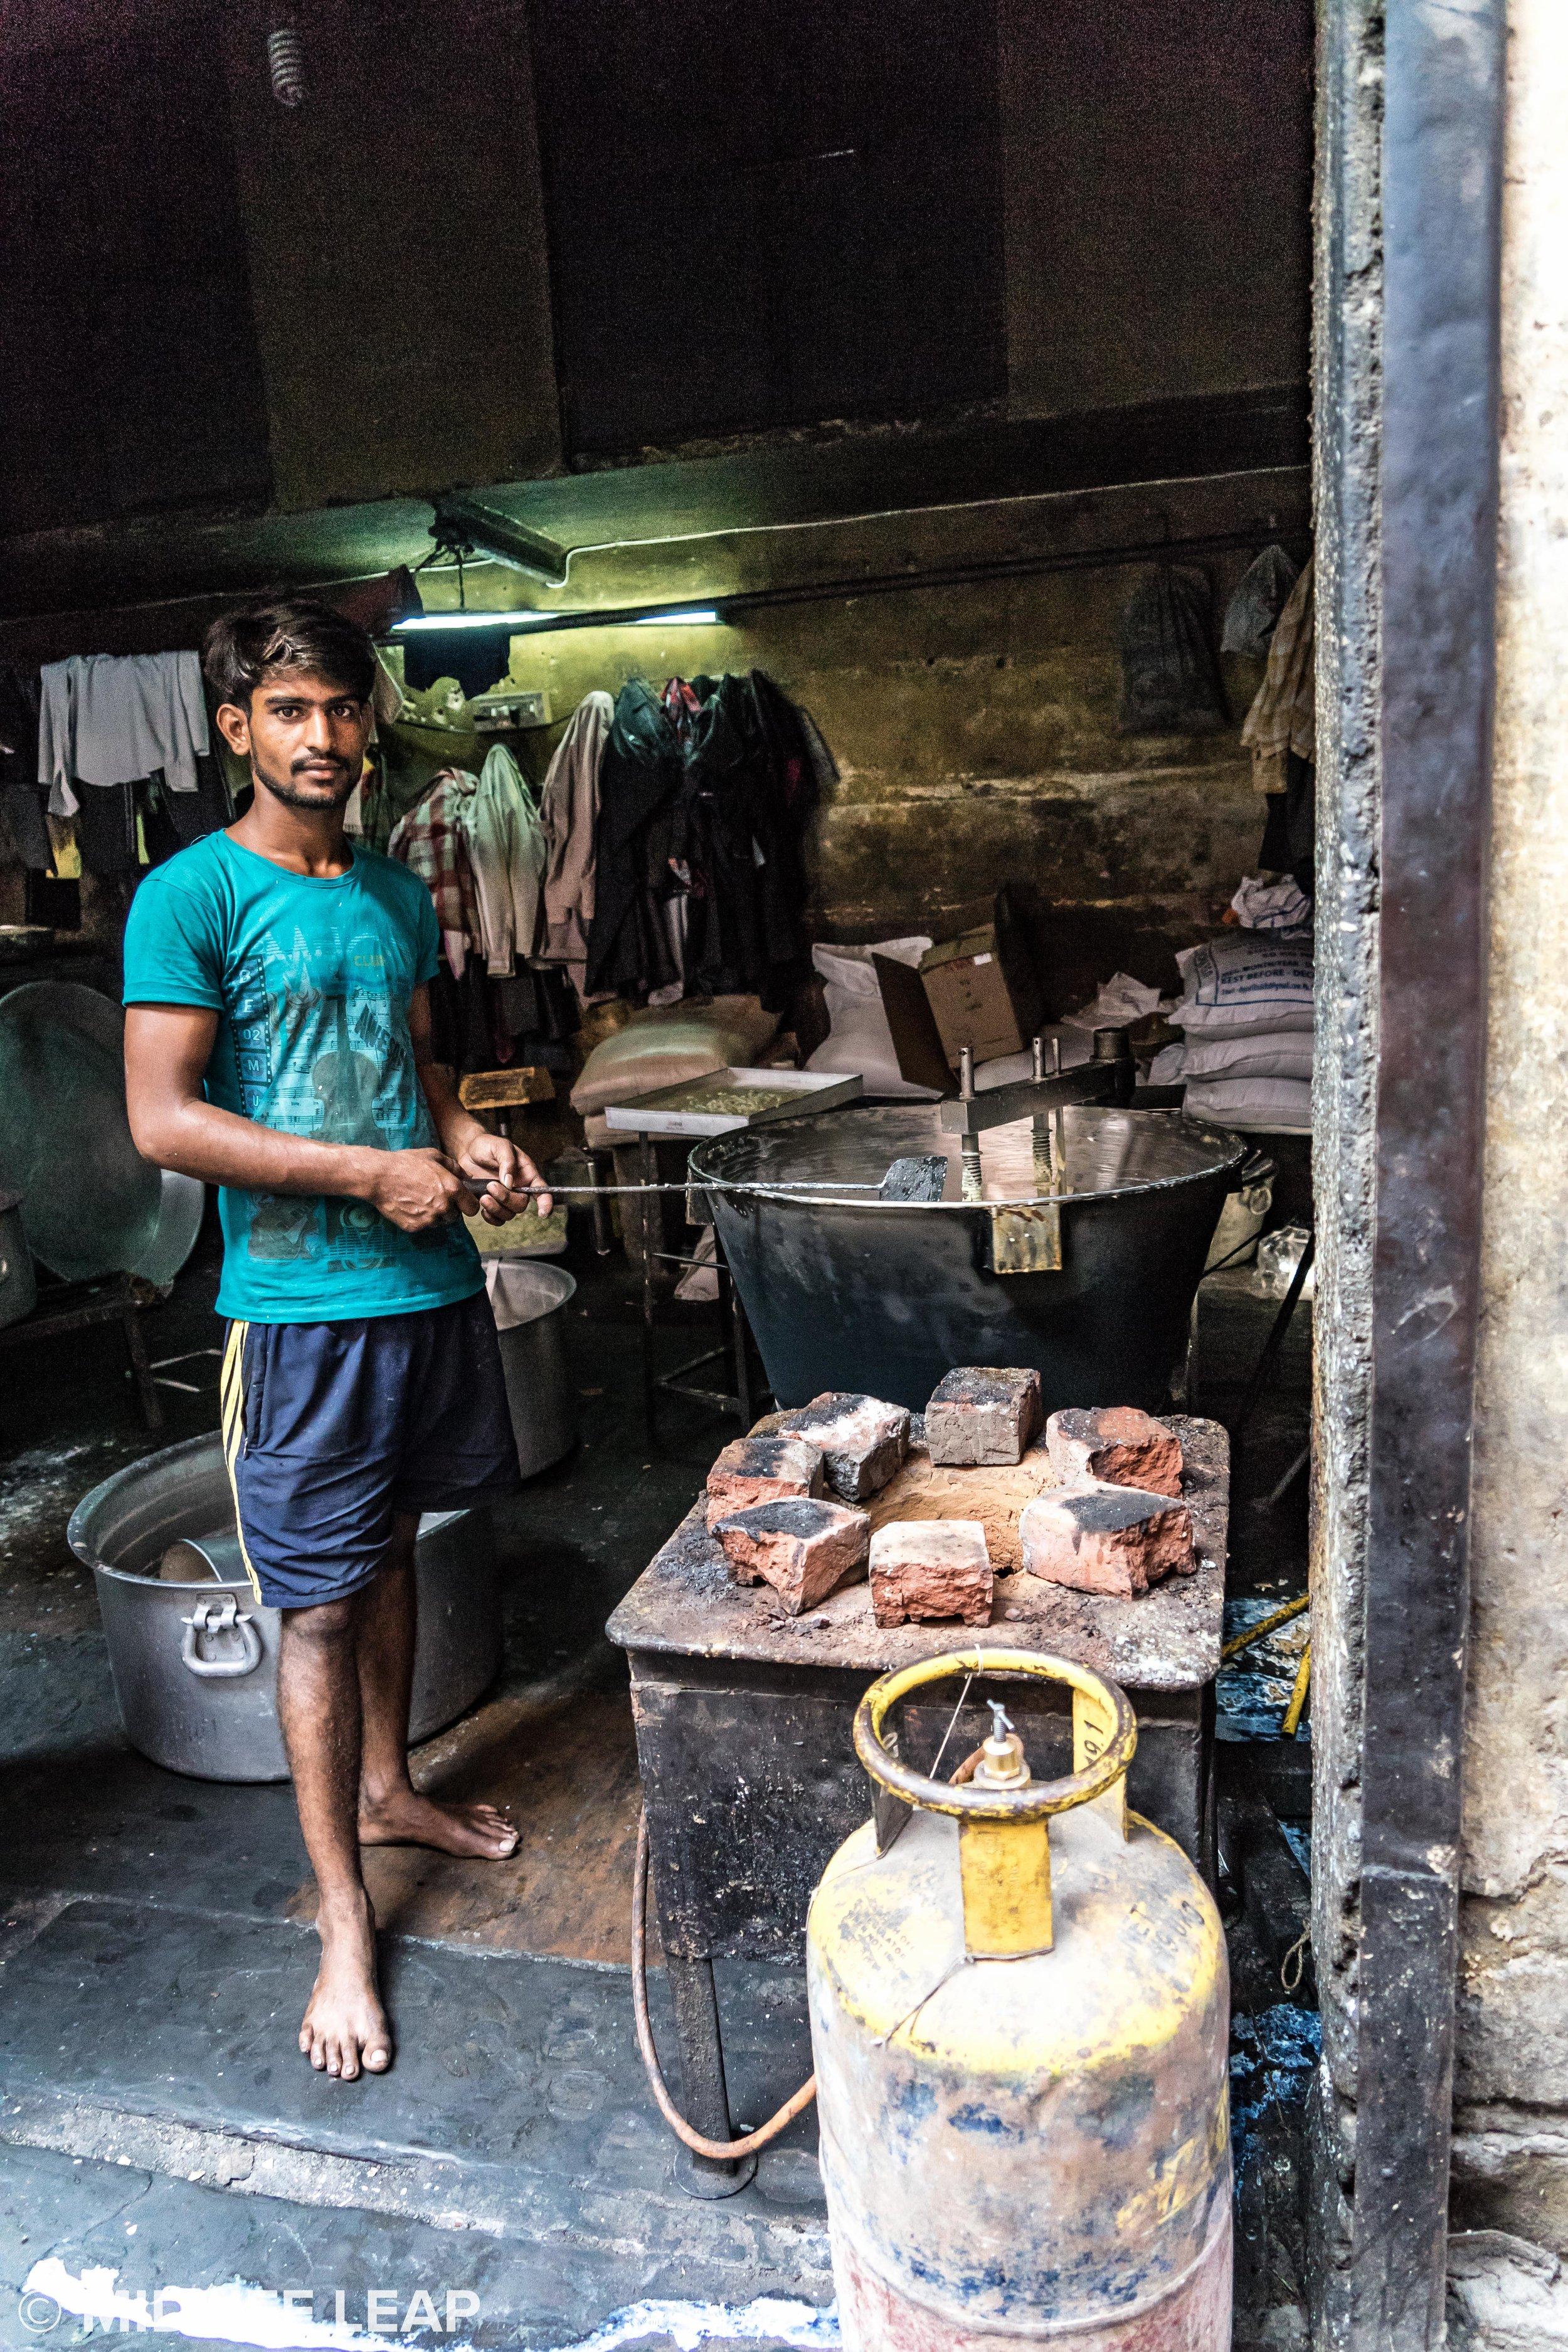 jaipur-street-scenes-markets-bazaars.jpg